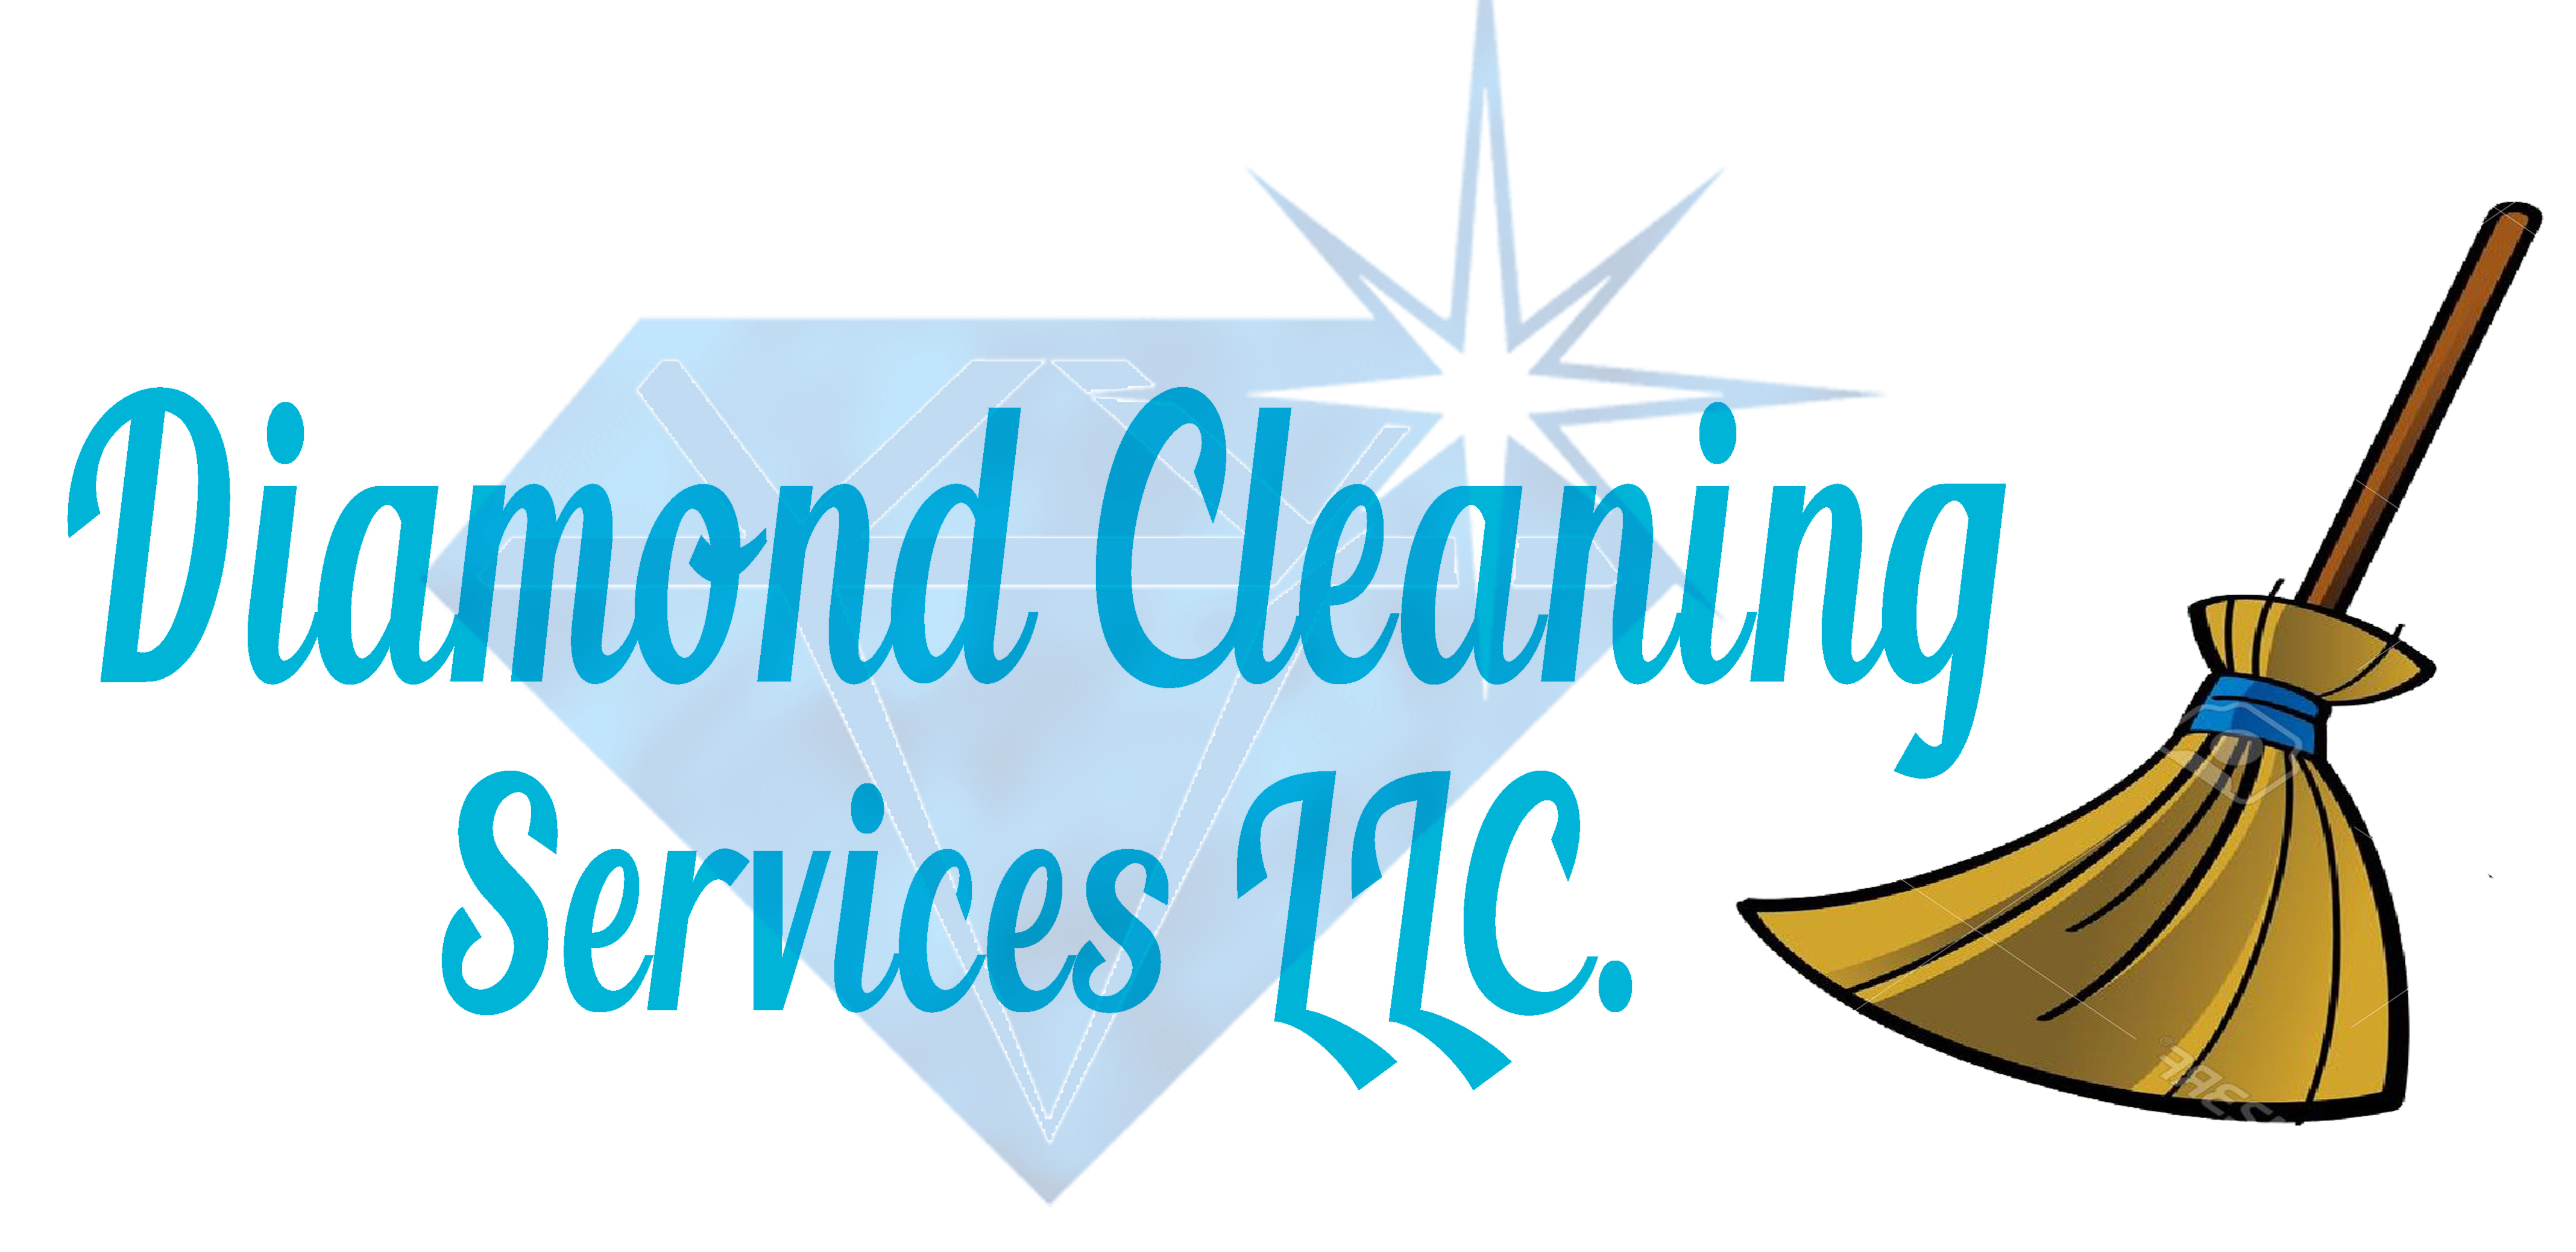 Diamond Cleaning Service Llc Reviews Phoenixville Pa